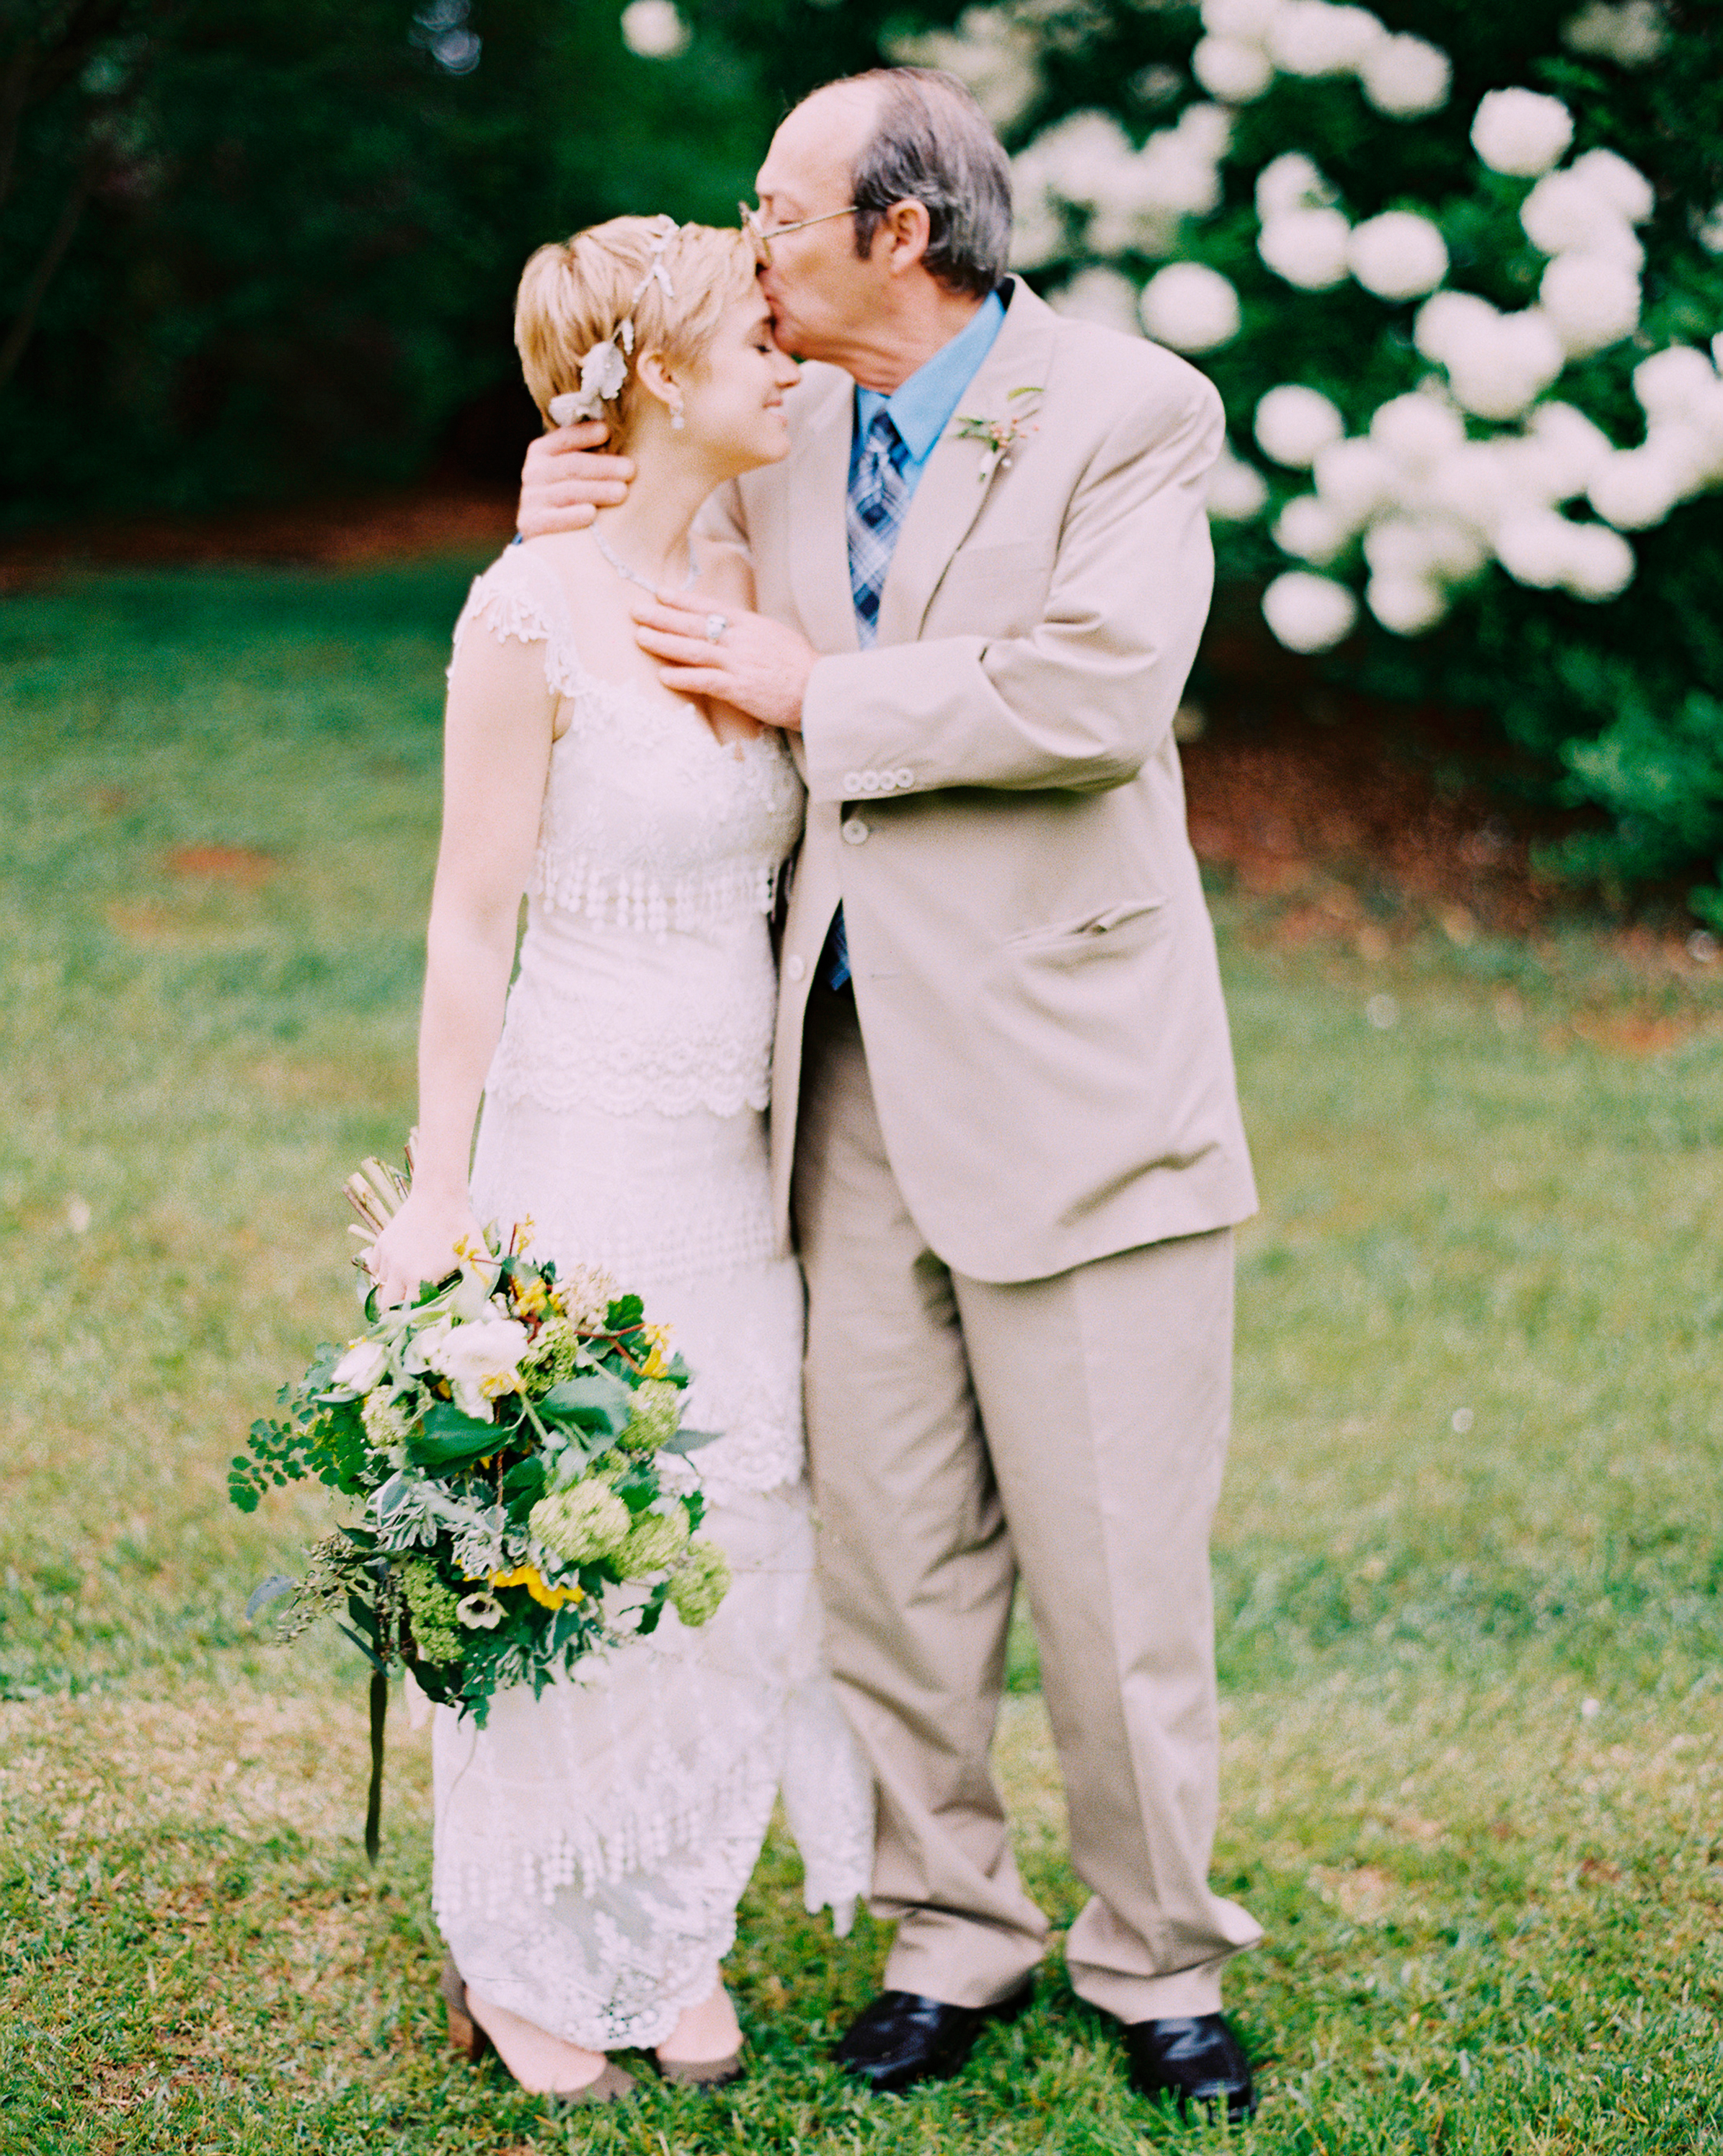 susan-cartter-wedding-dad-008439010-s111503-0914.jpg